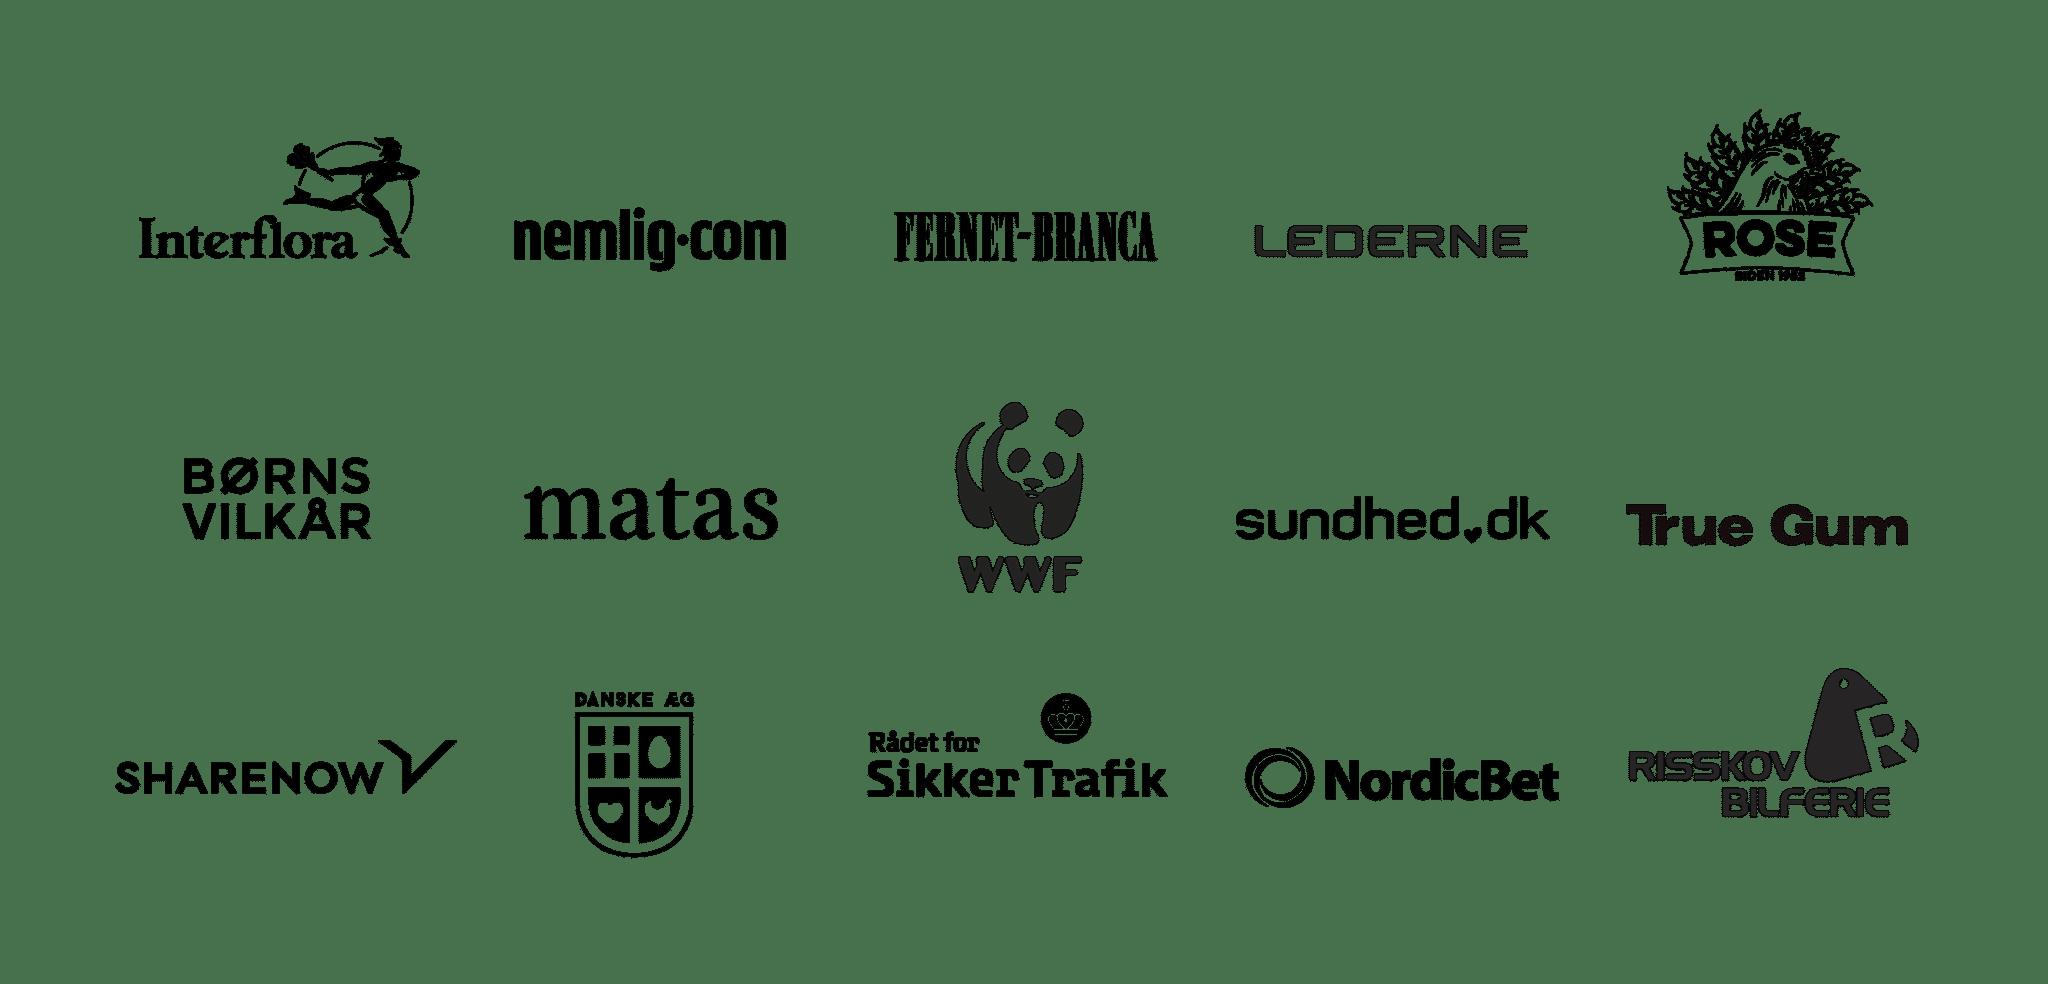 logos3v2-01